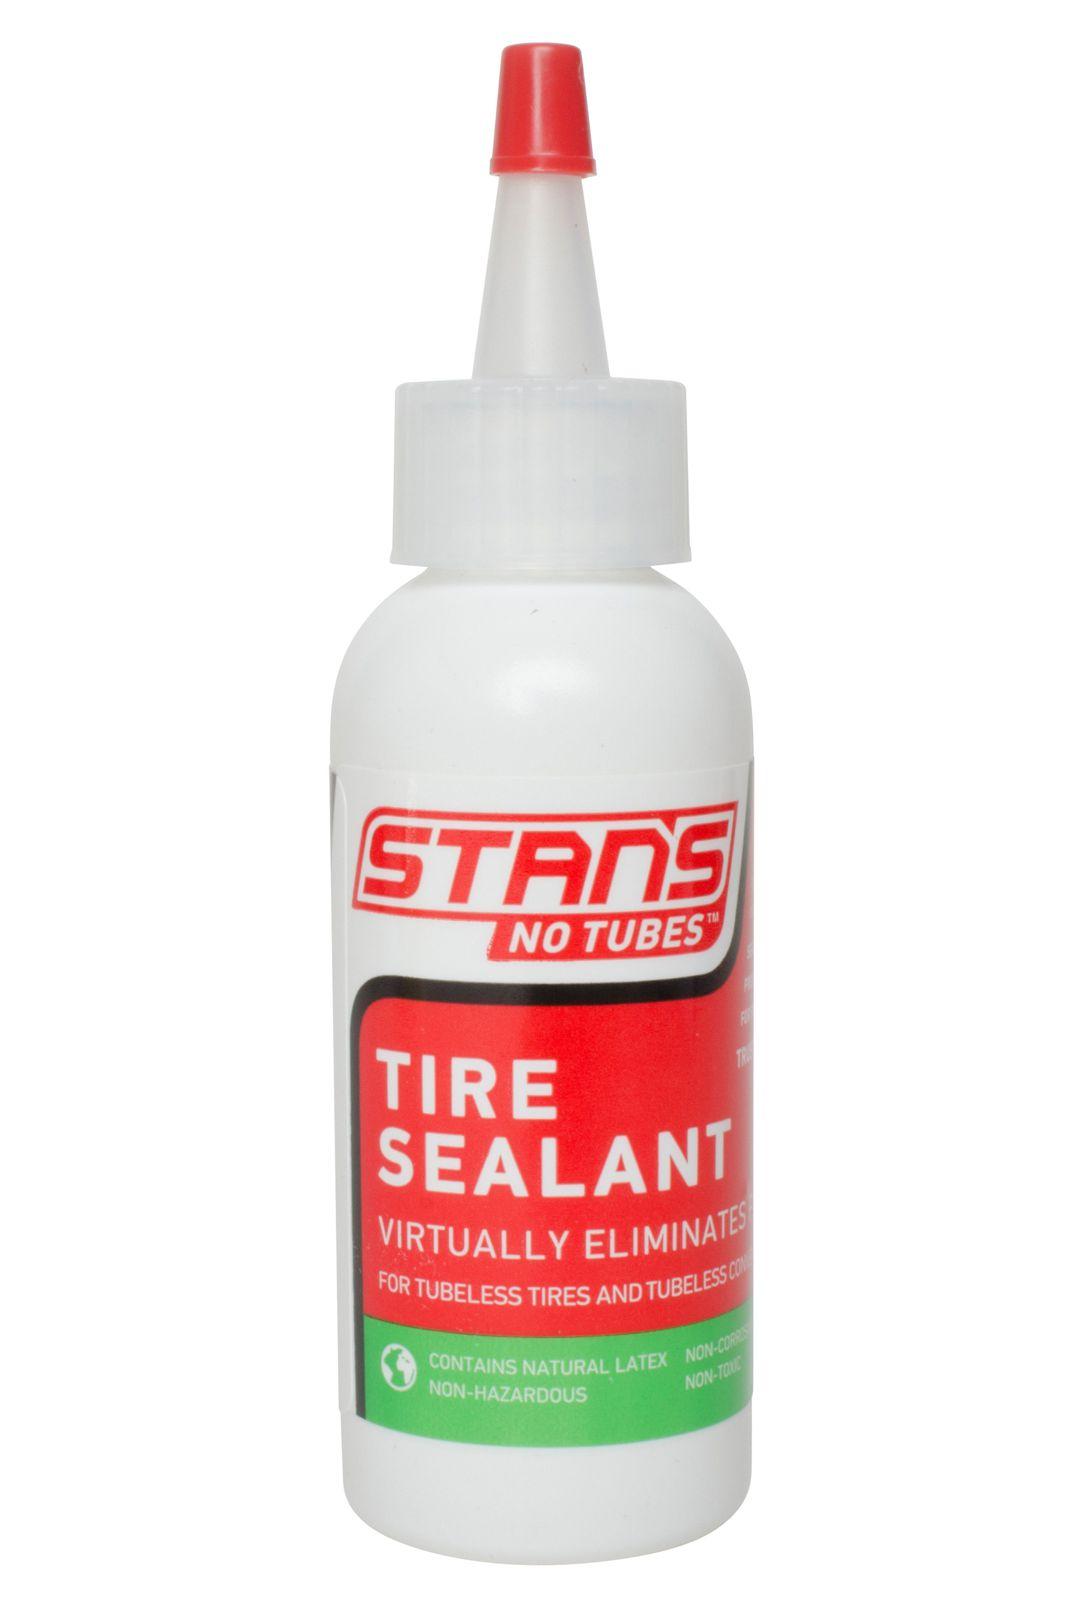 Stan's Tire Sealant - 2 Ounce Bottle